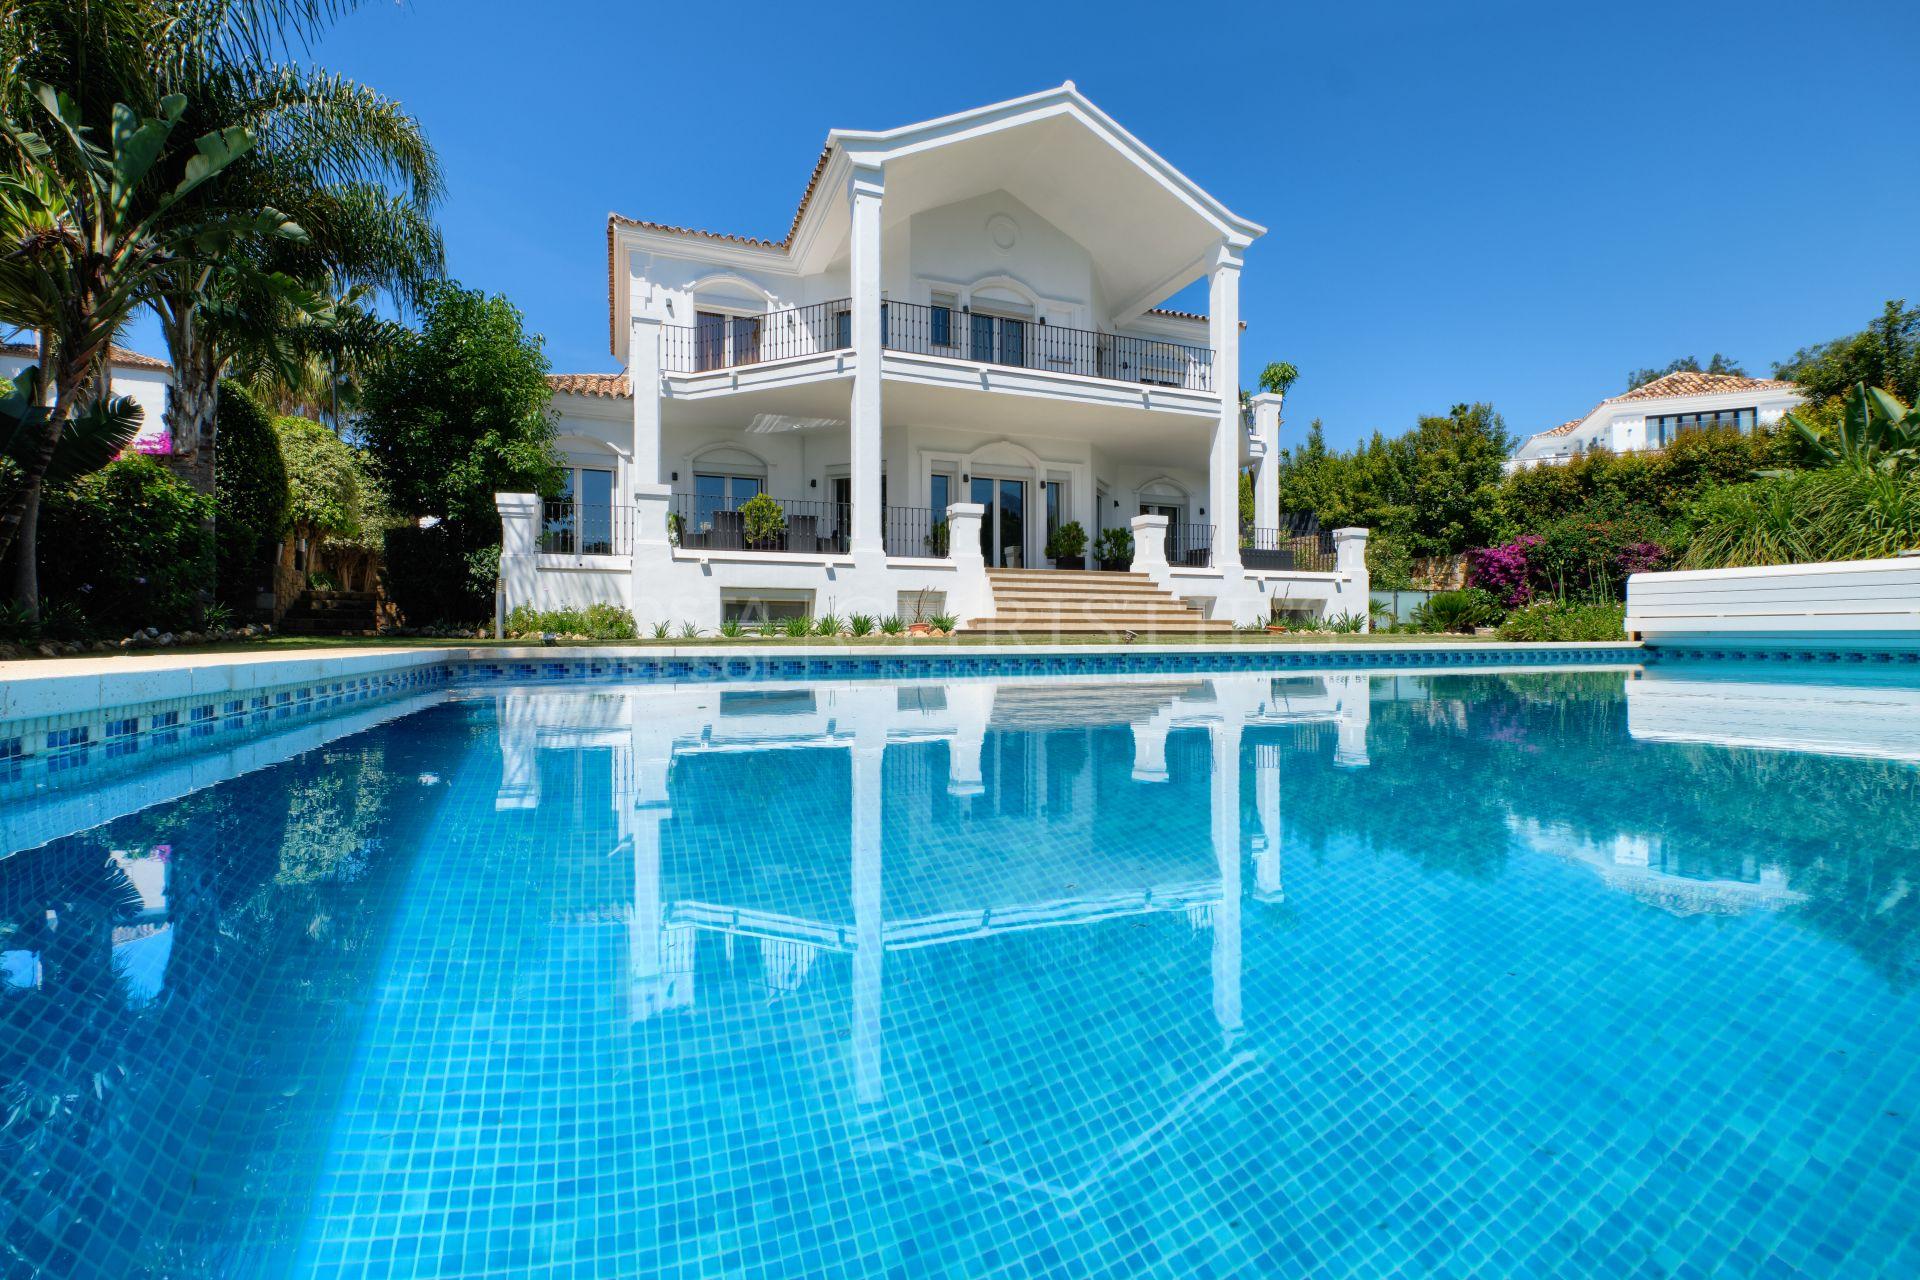 Elegant villa for sale in Nueva Andalucia, Marbella | Christie's International Real Estate